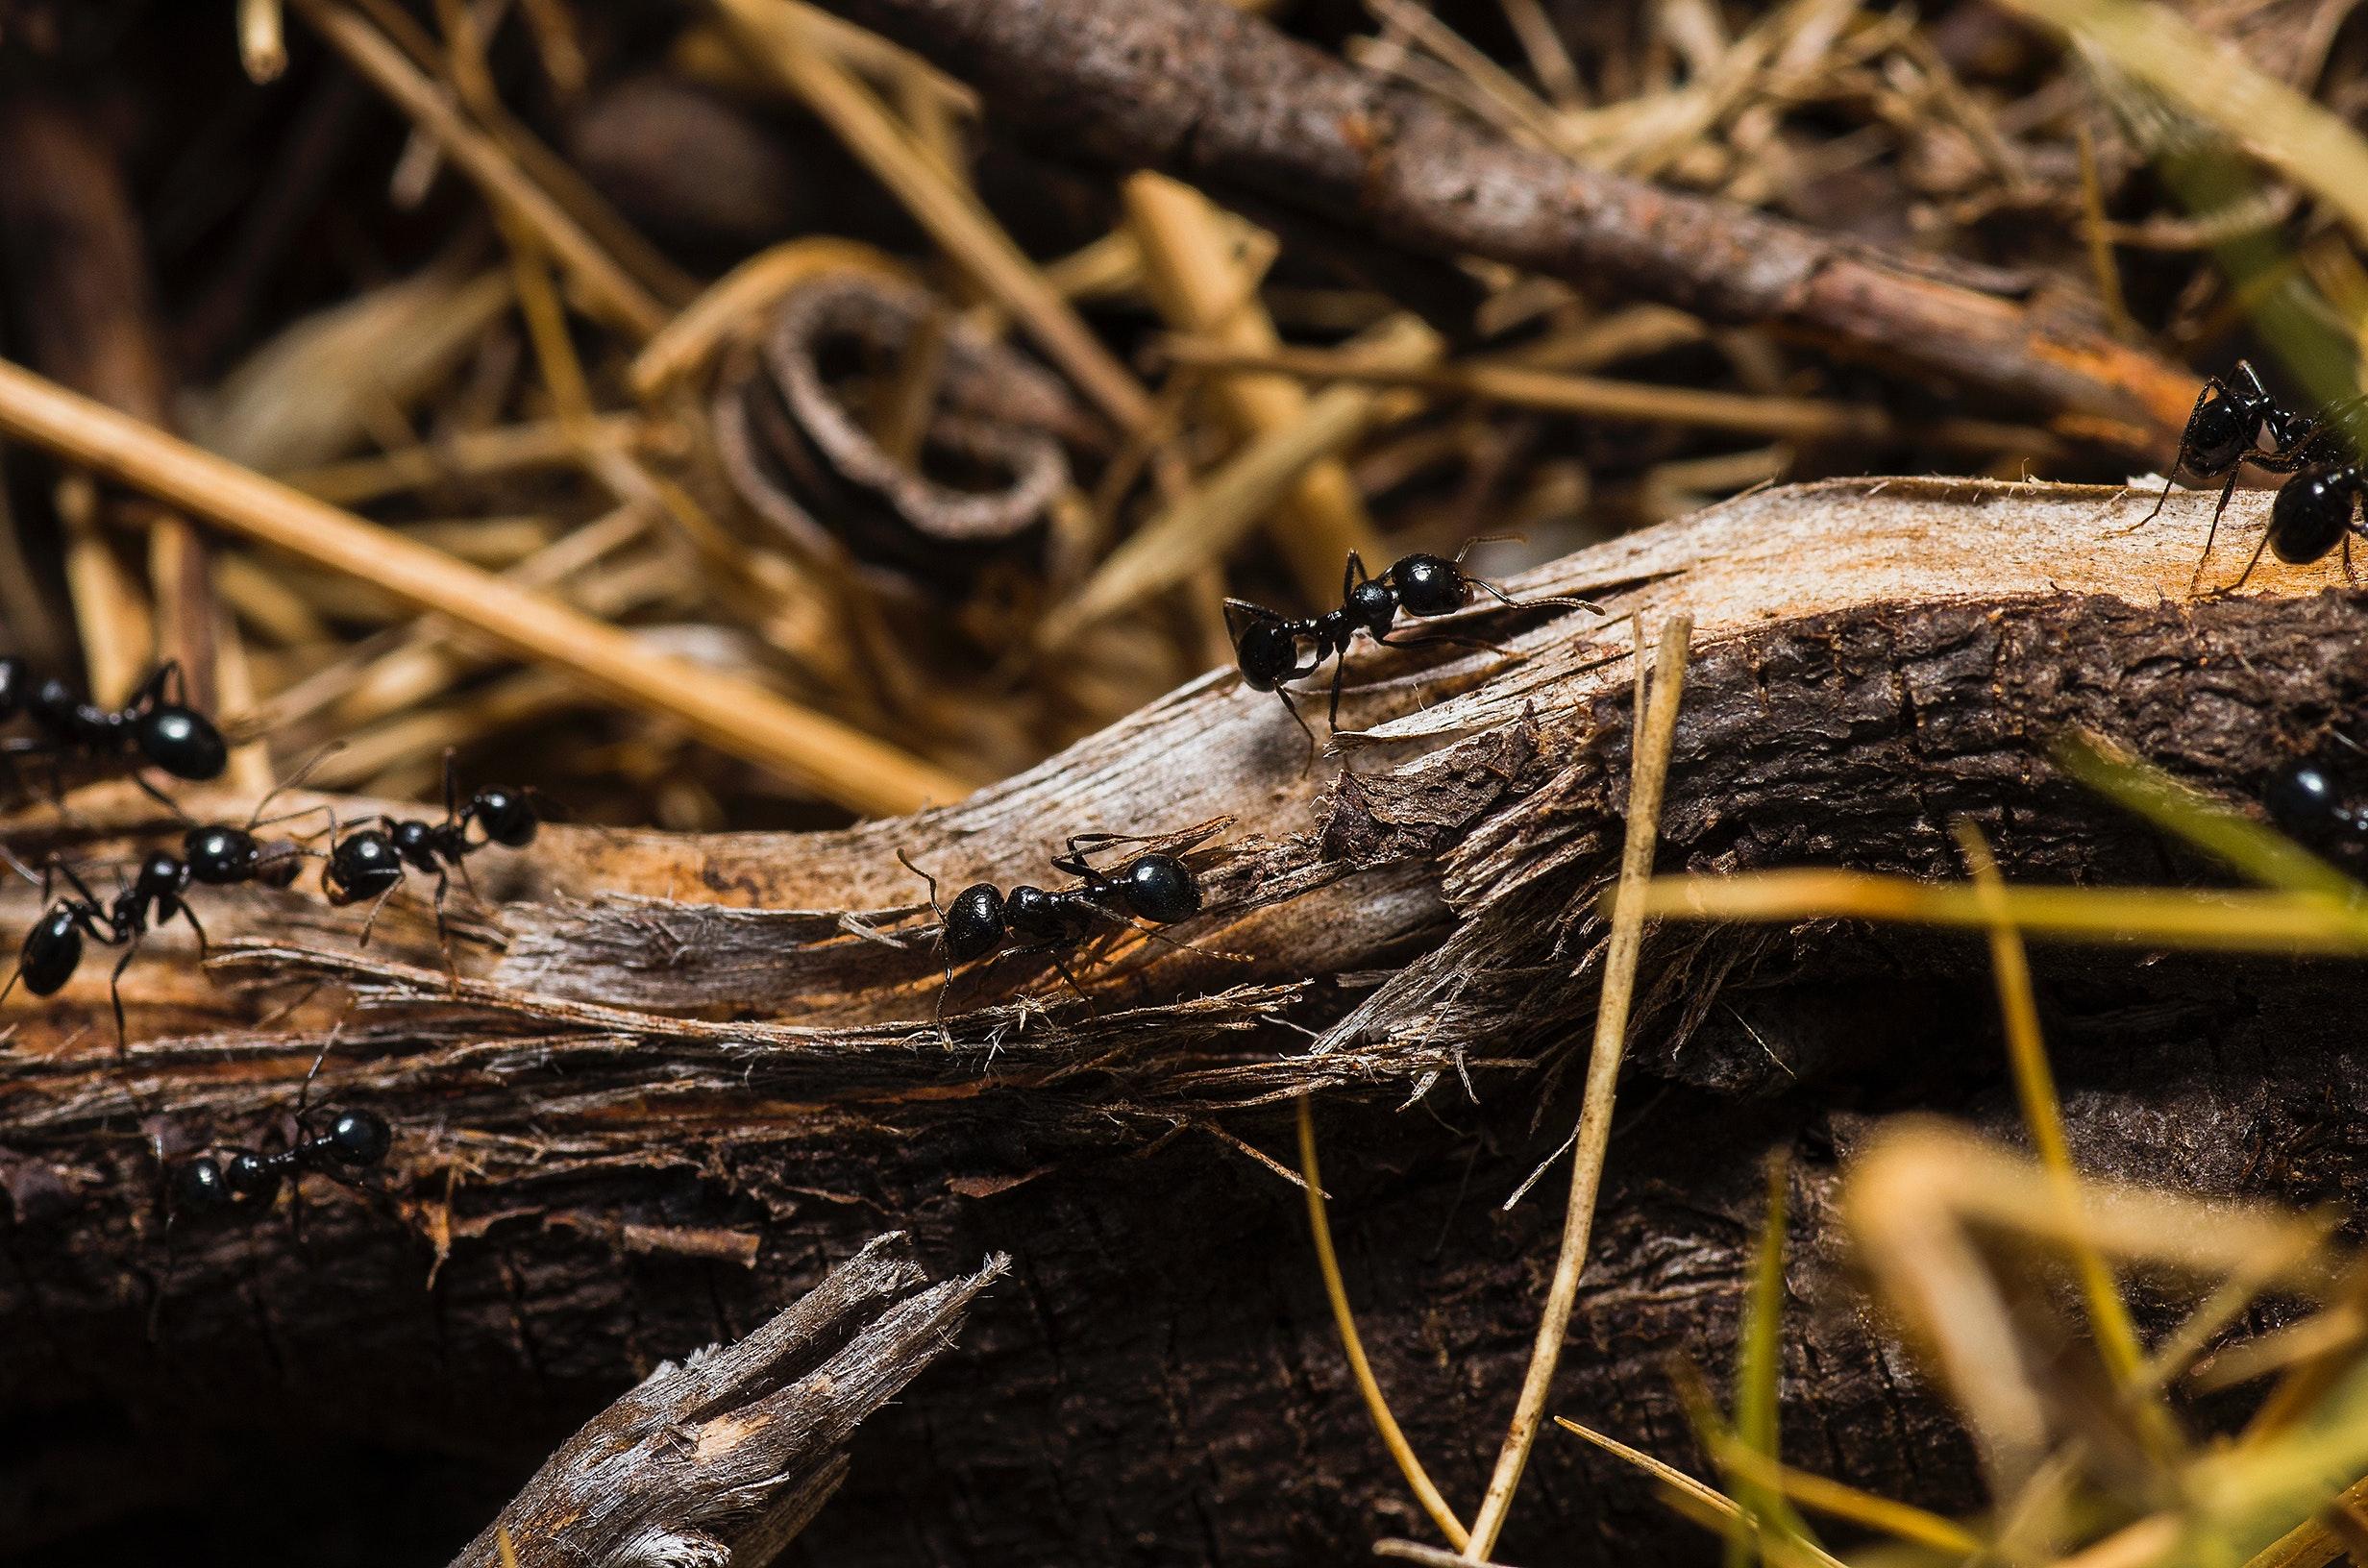 Black ants on brown tree trunks photo